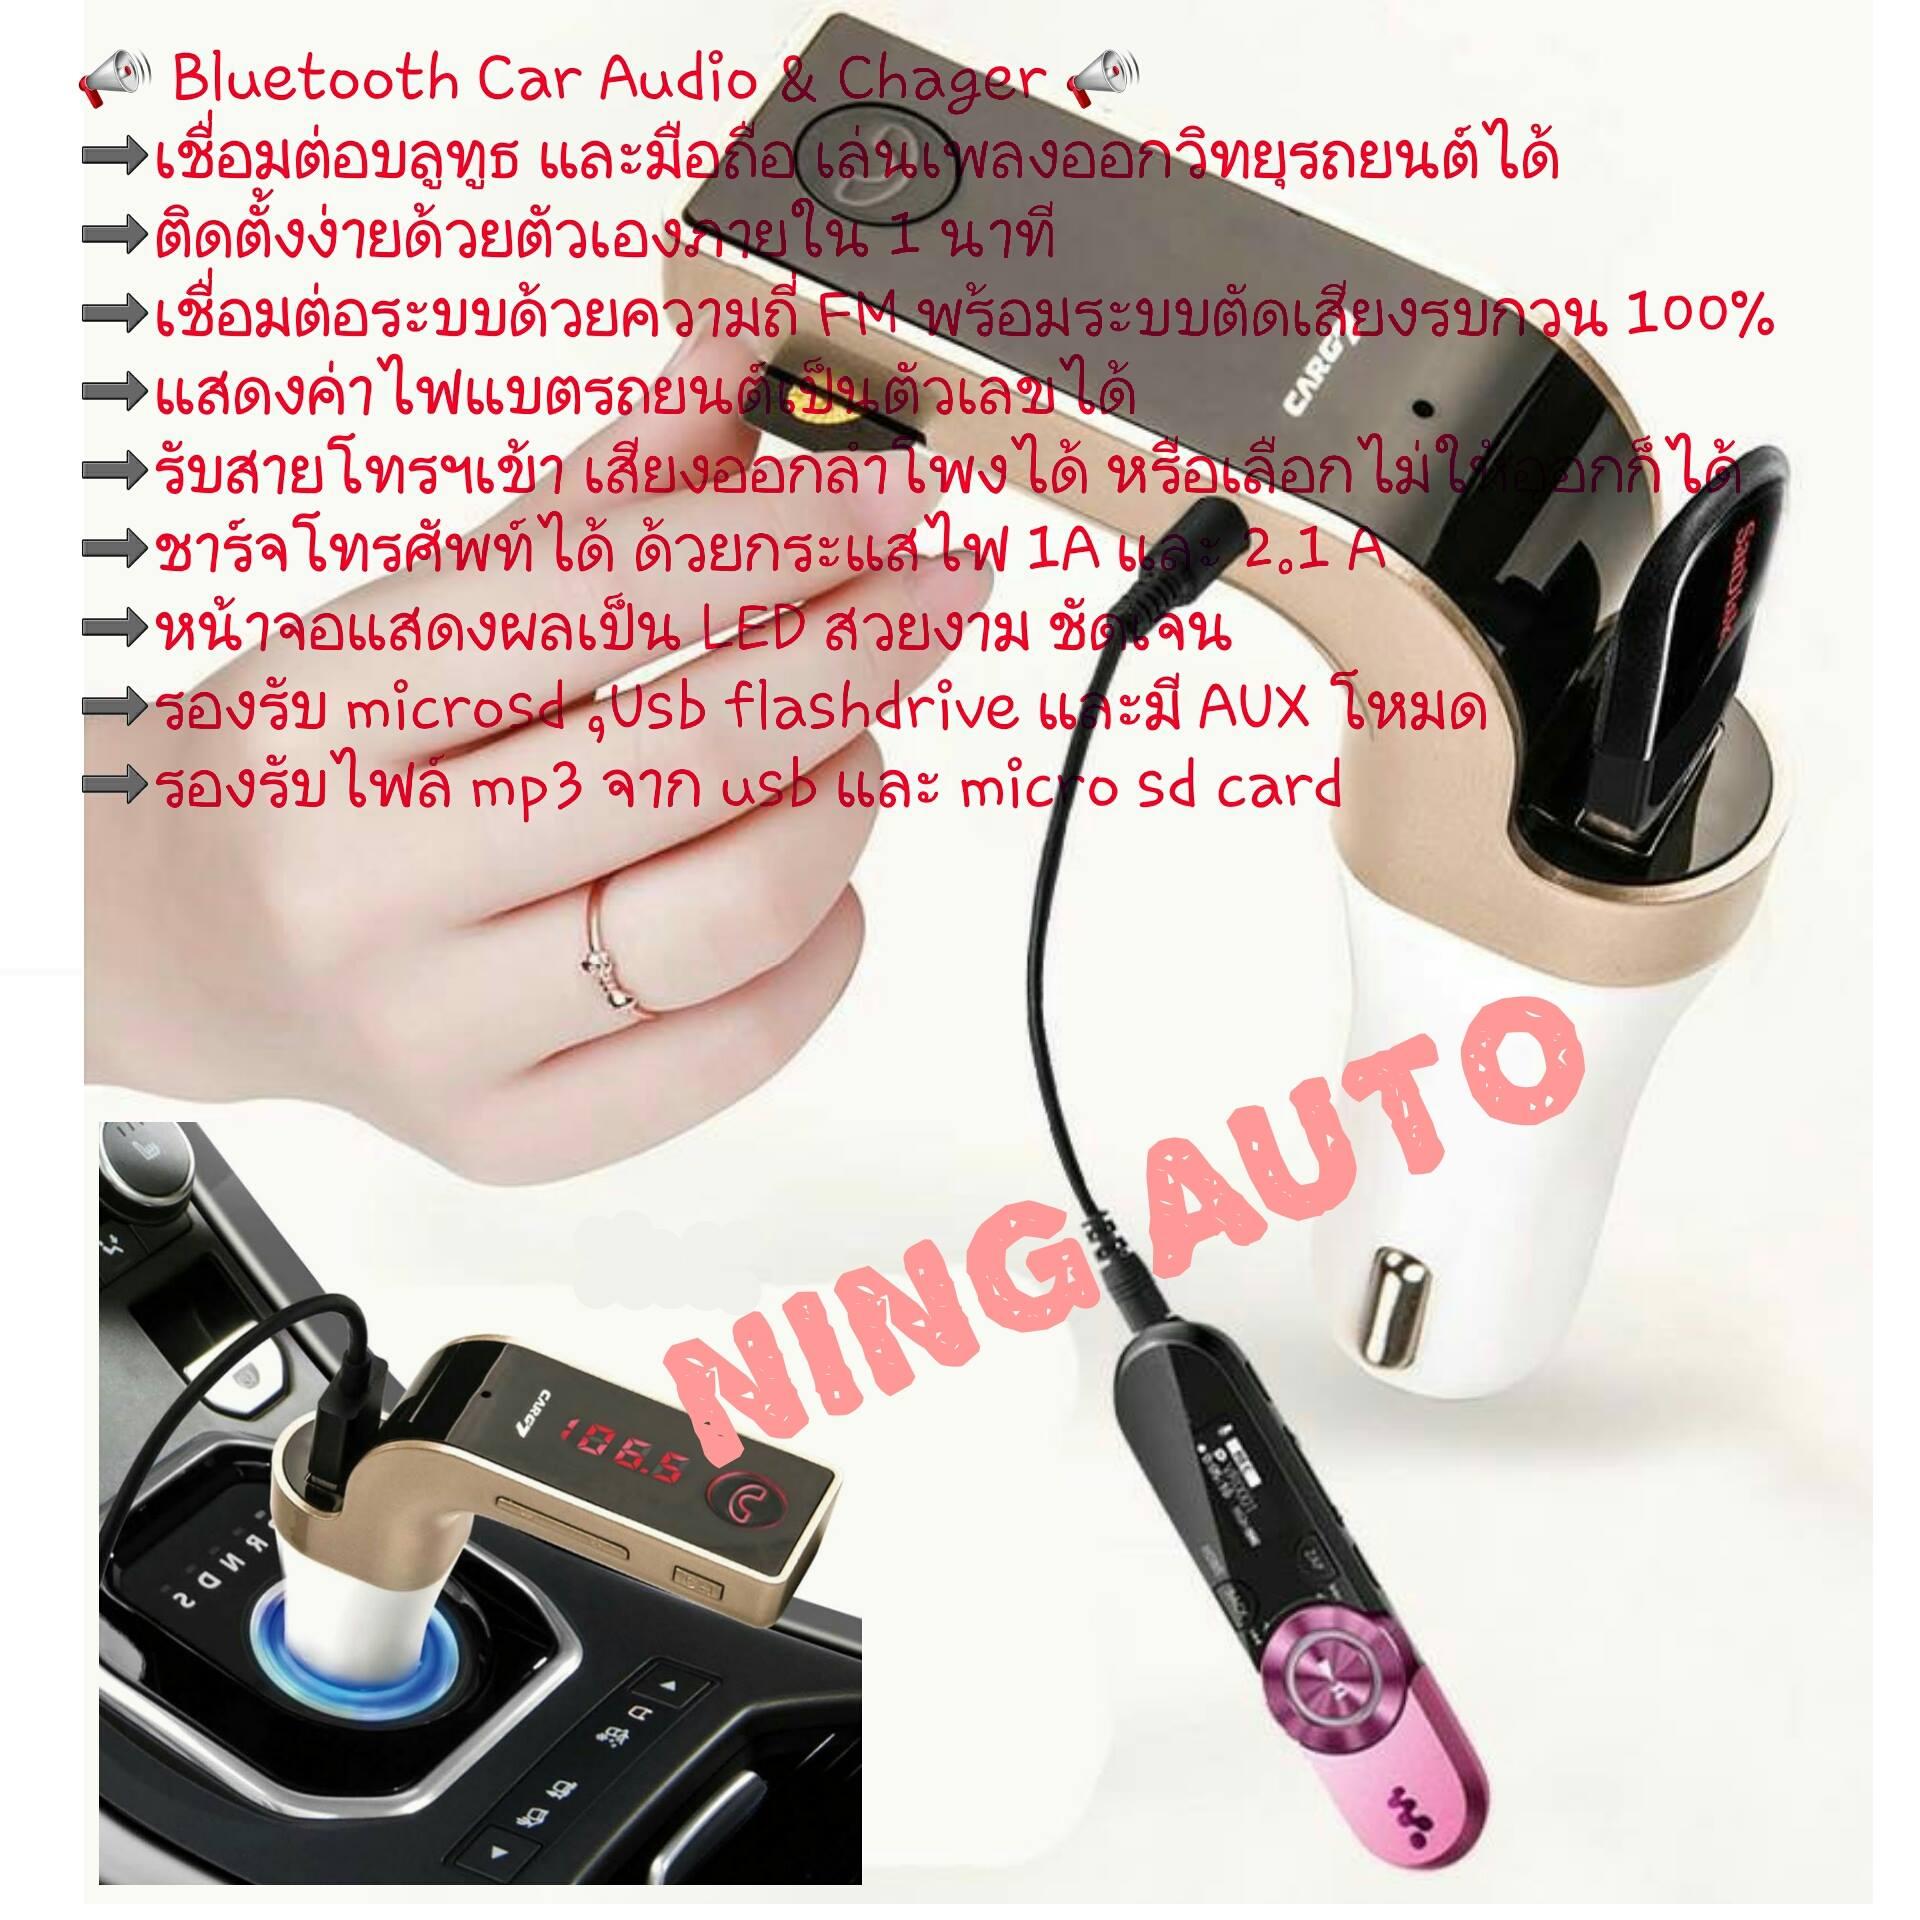 Bluetooth Car Audio & Chager